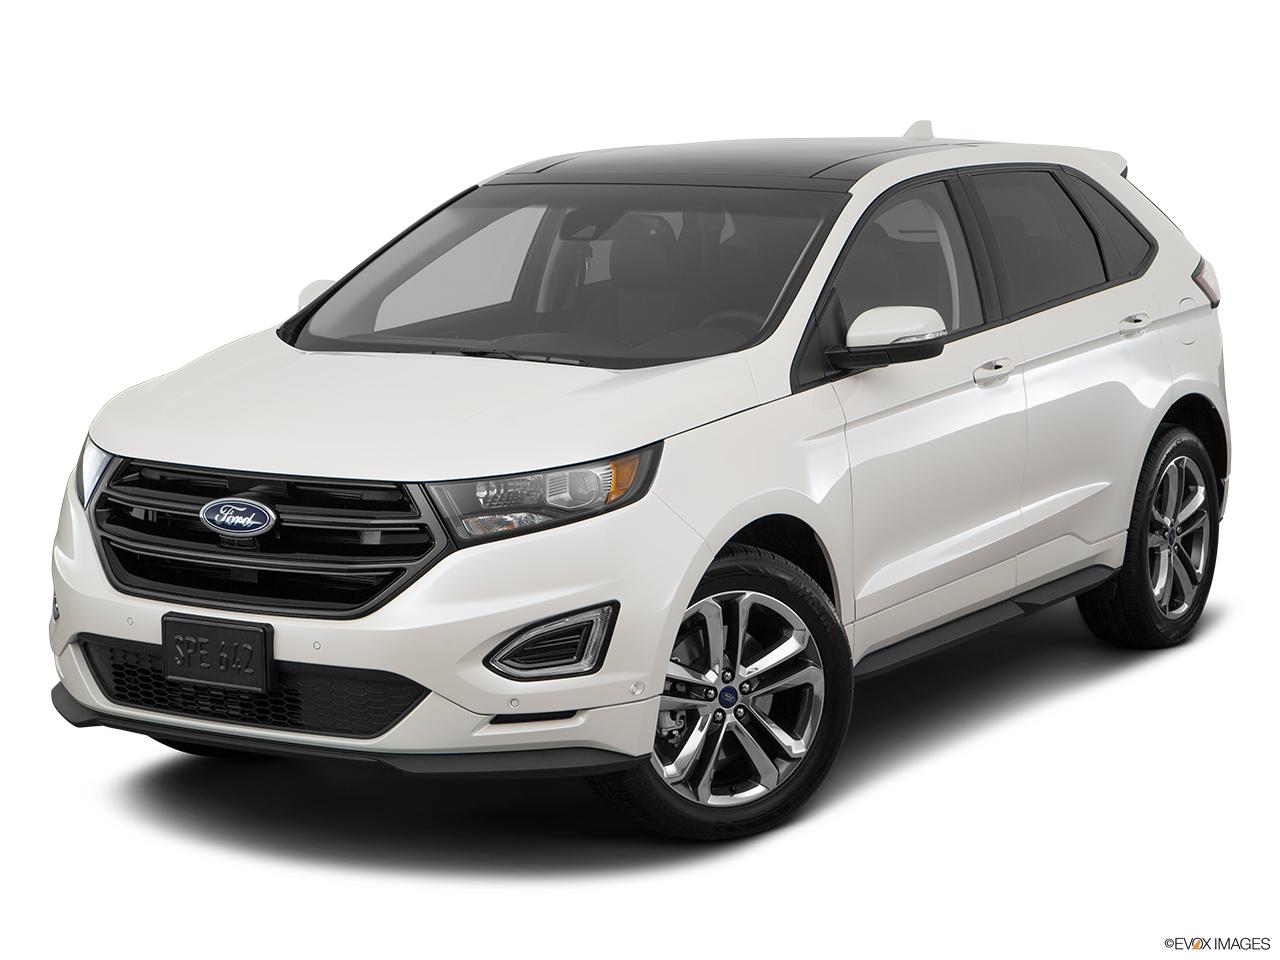 ford edge prices  uae gulf specs reviews  dubai abu dhabi  sharjah yallamotor